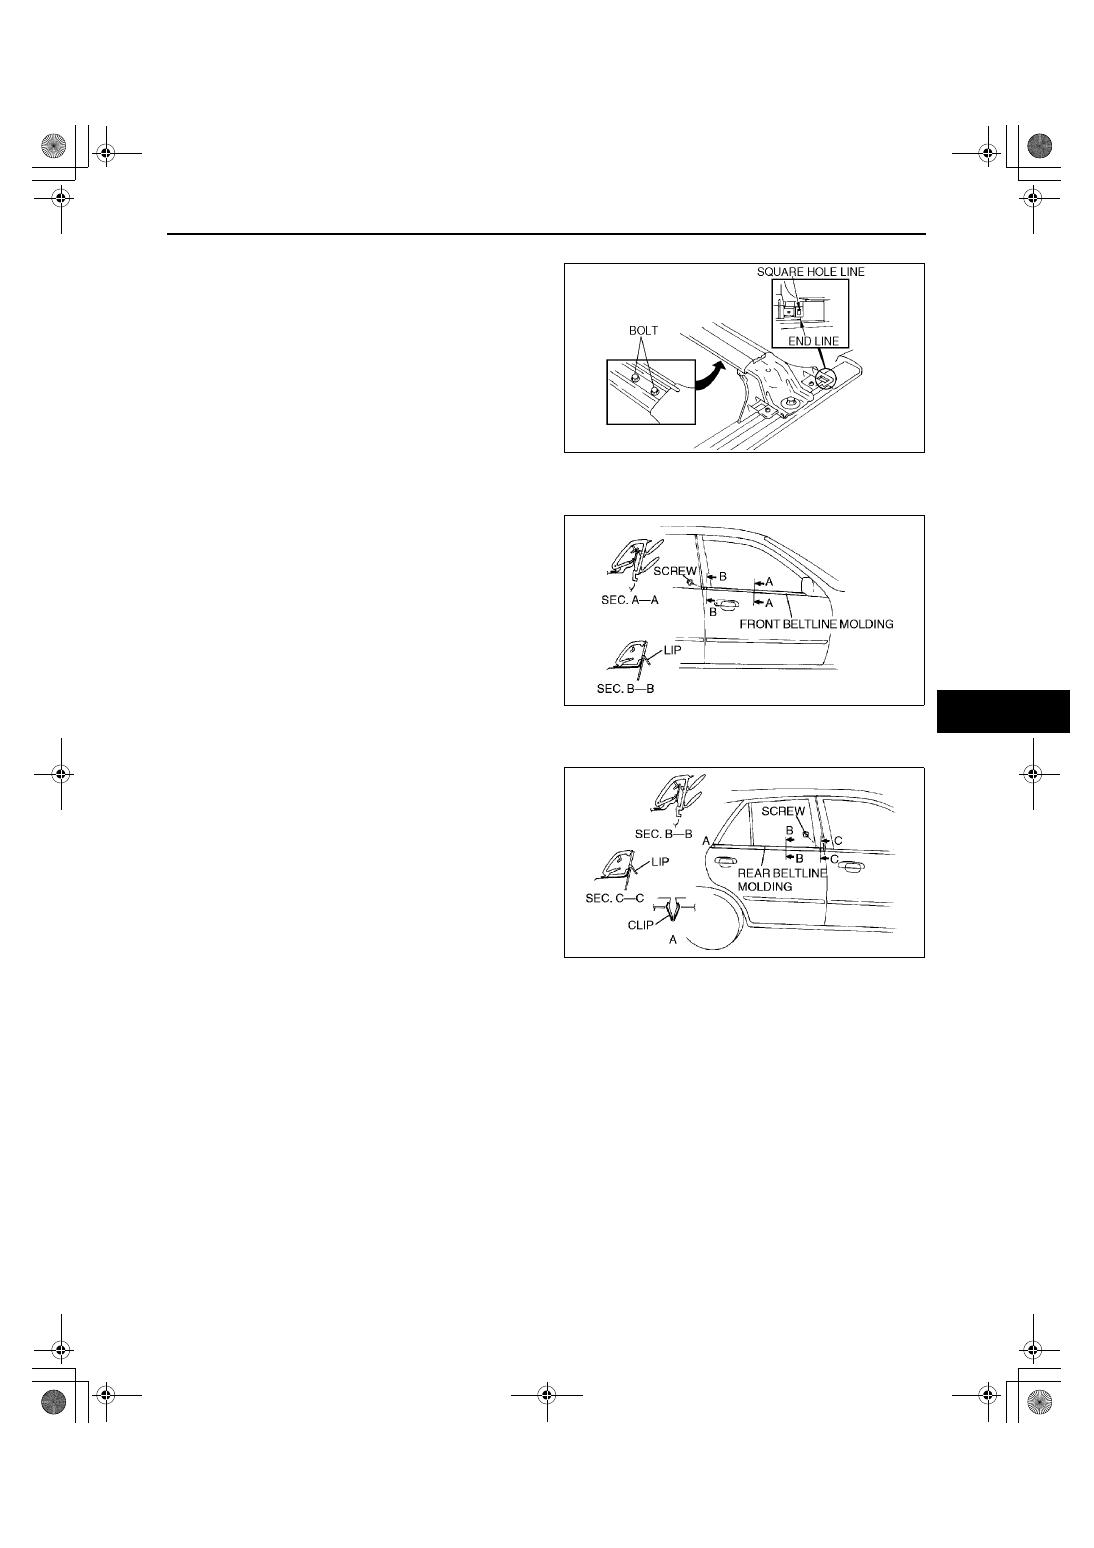 Mazda 3 Service Manual: Combination Switch DisassemblyAssembly